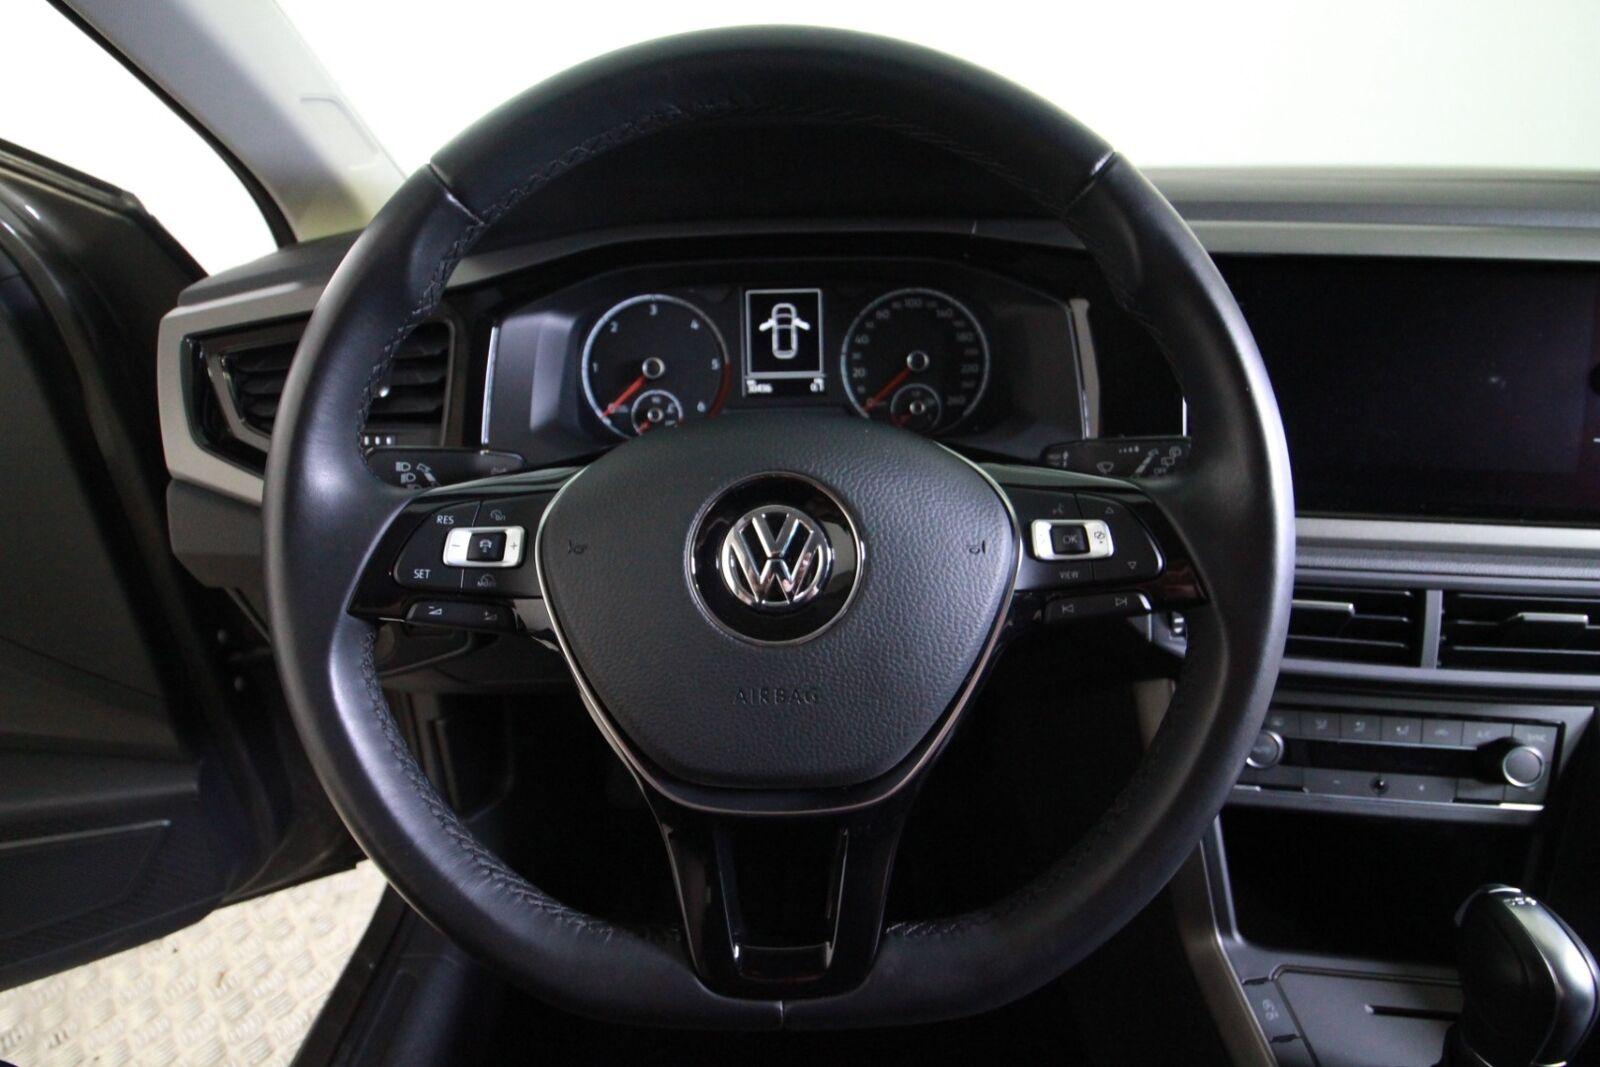 VW Polo TDi 95 Comfortline DSG